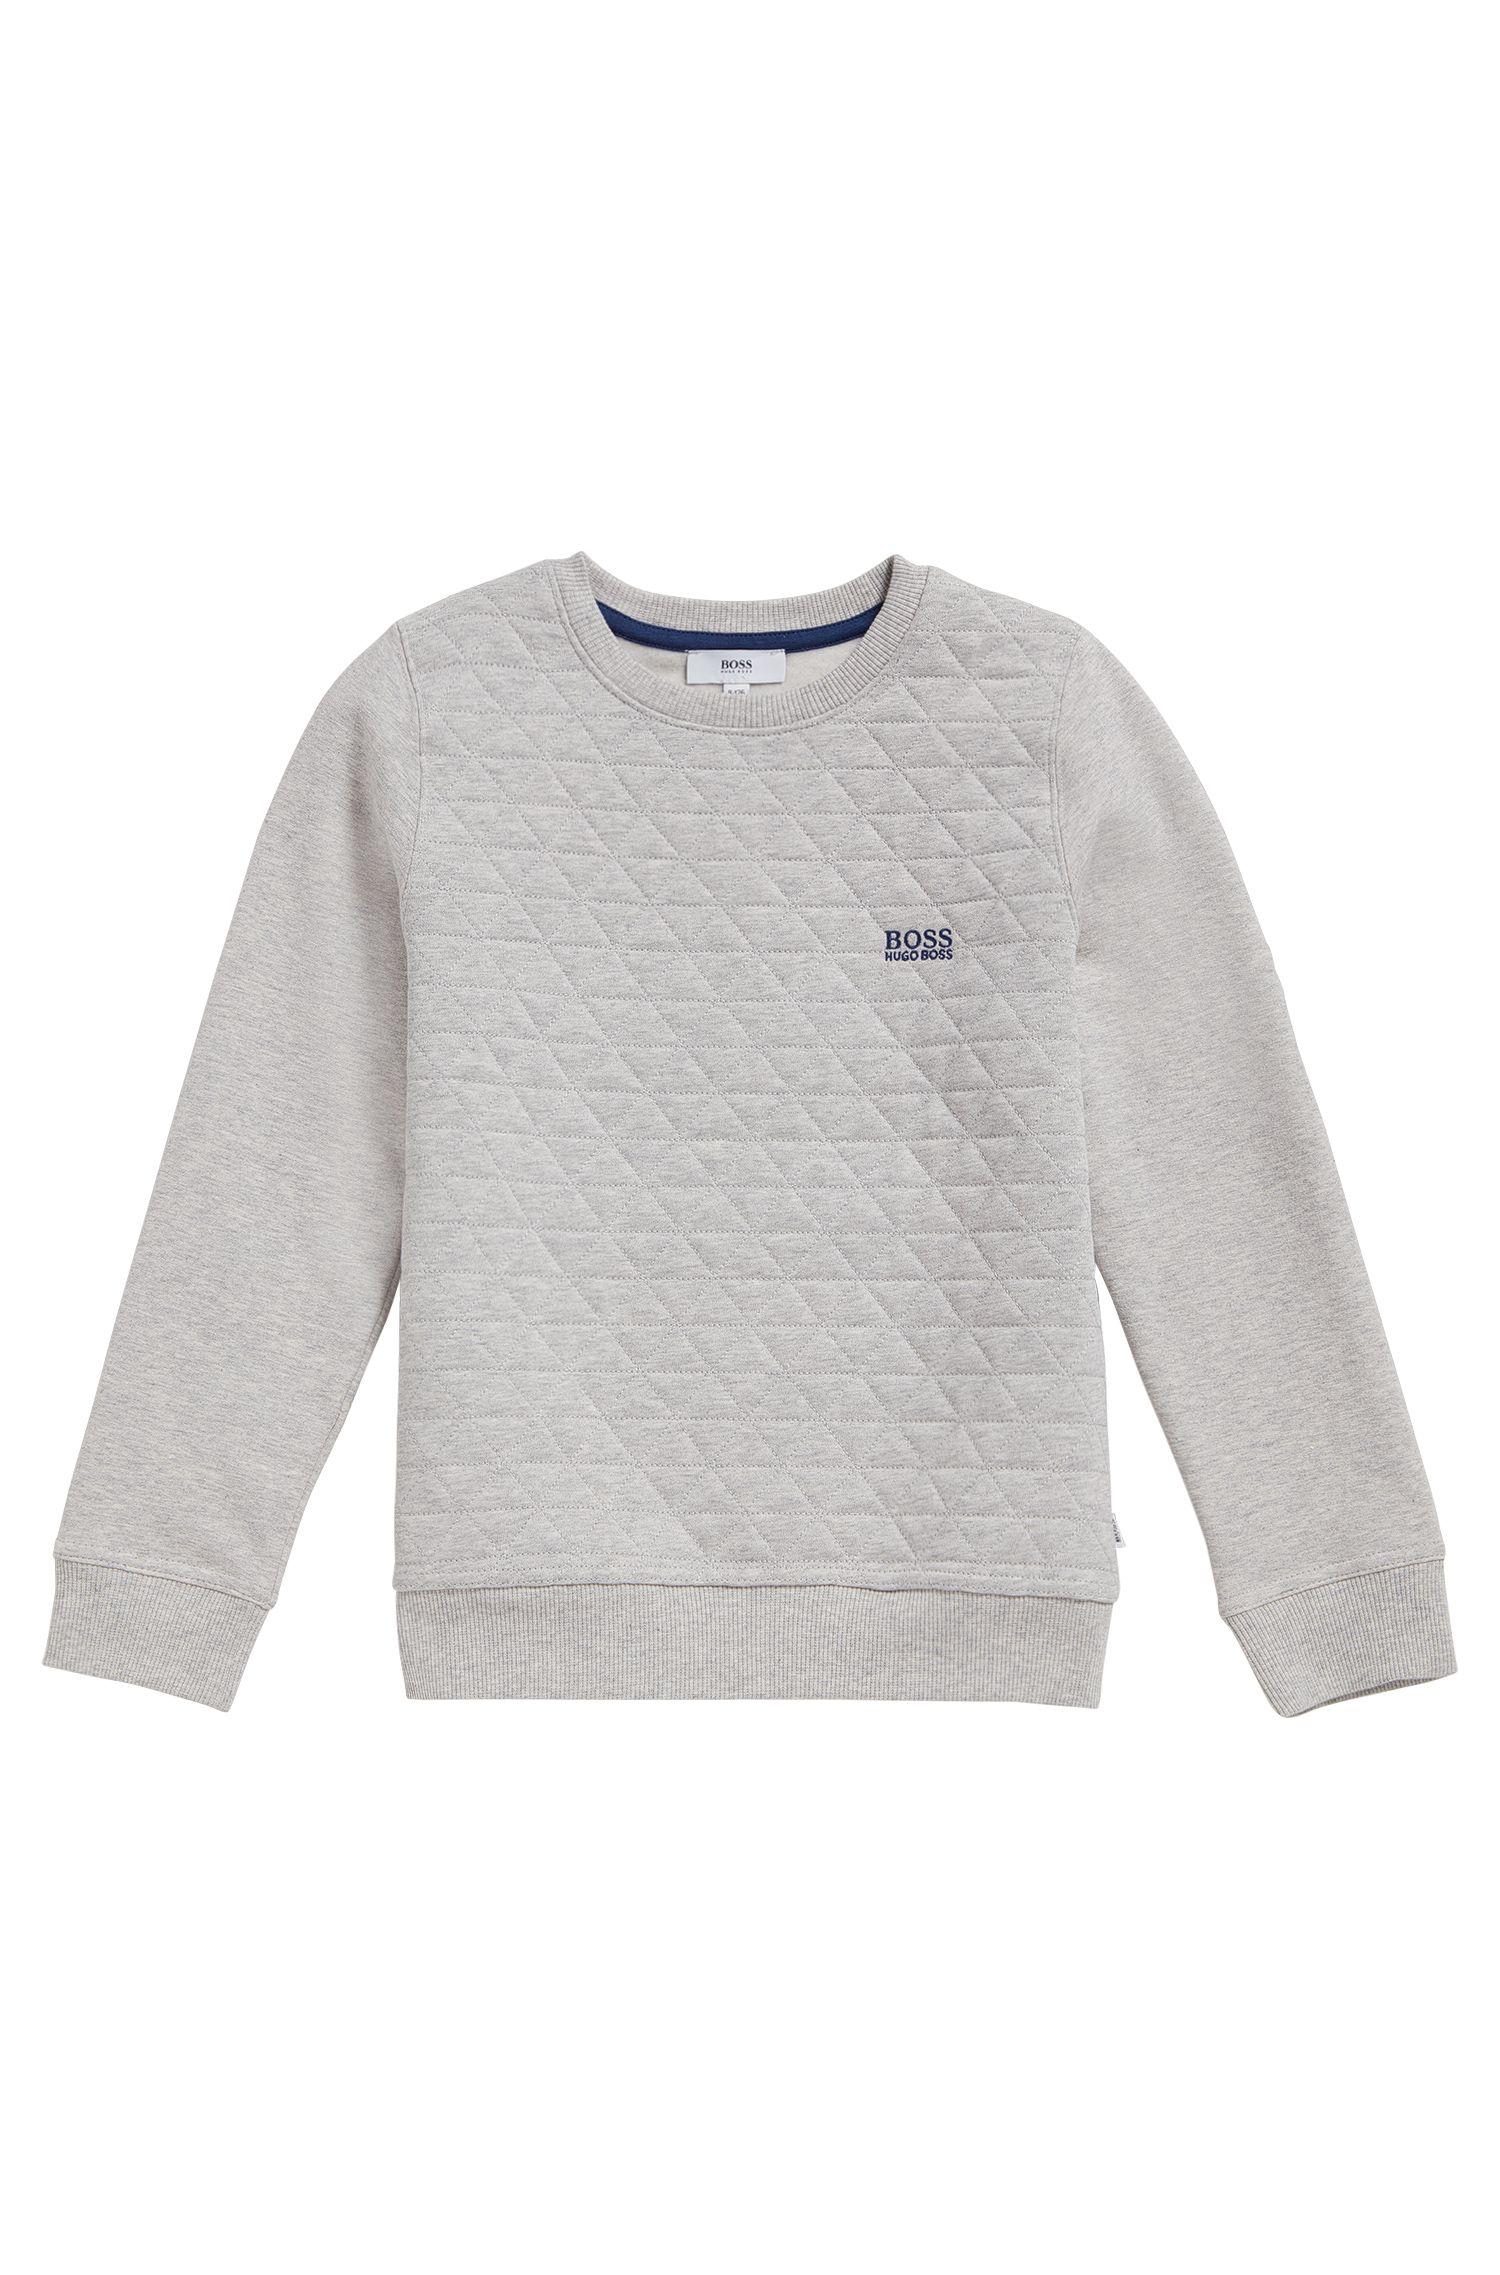 Kids' sweatshirt in stretch cotton blend: 'J25A03'